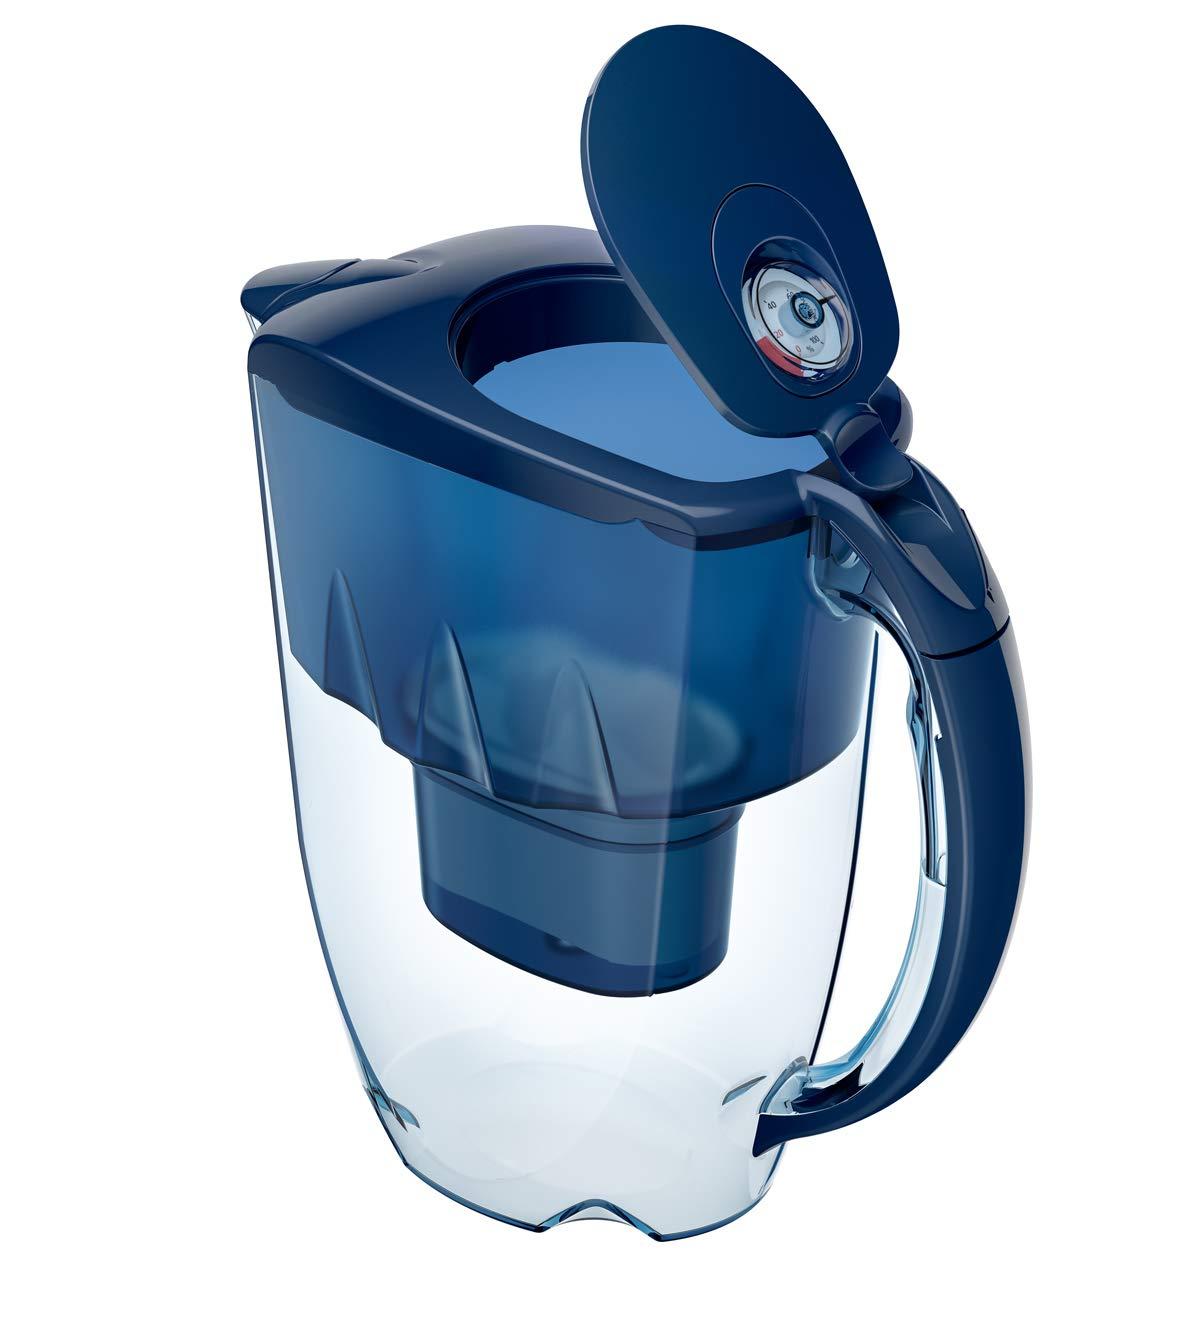 2,8 l Caraffa filtrante per acqua colore: Blu cobalto Aquaphor Jasper